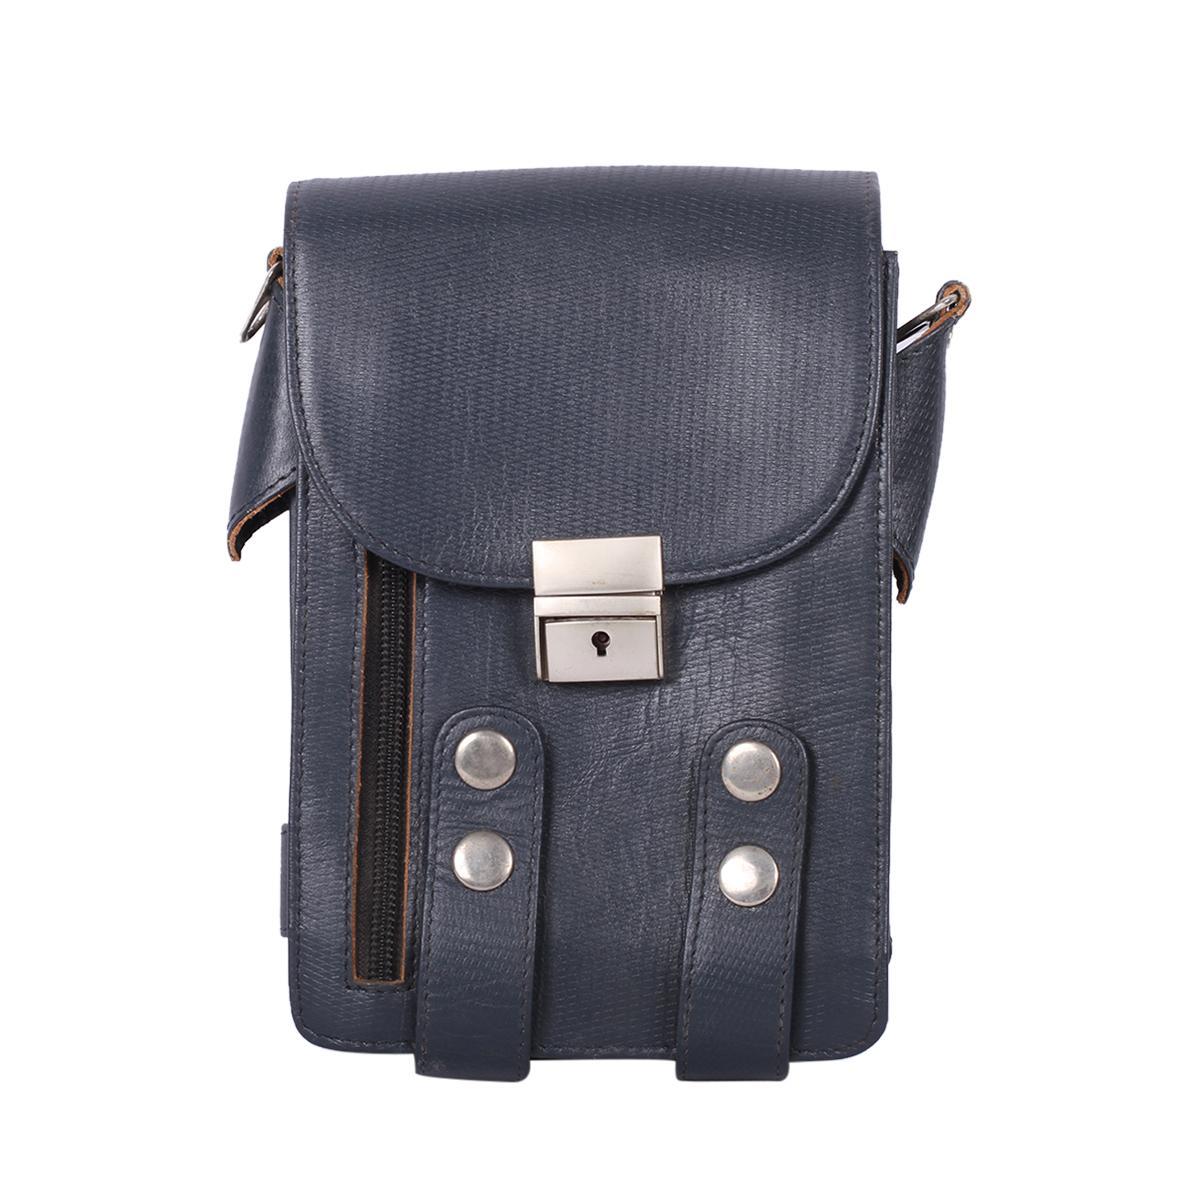 960436dcf6db Men Business Bags - Buy Men Business Bags at Best Price in ...